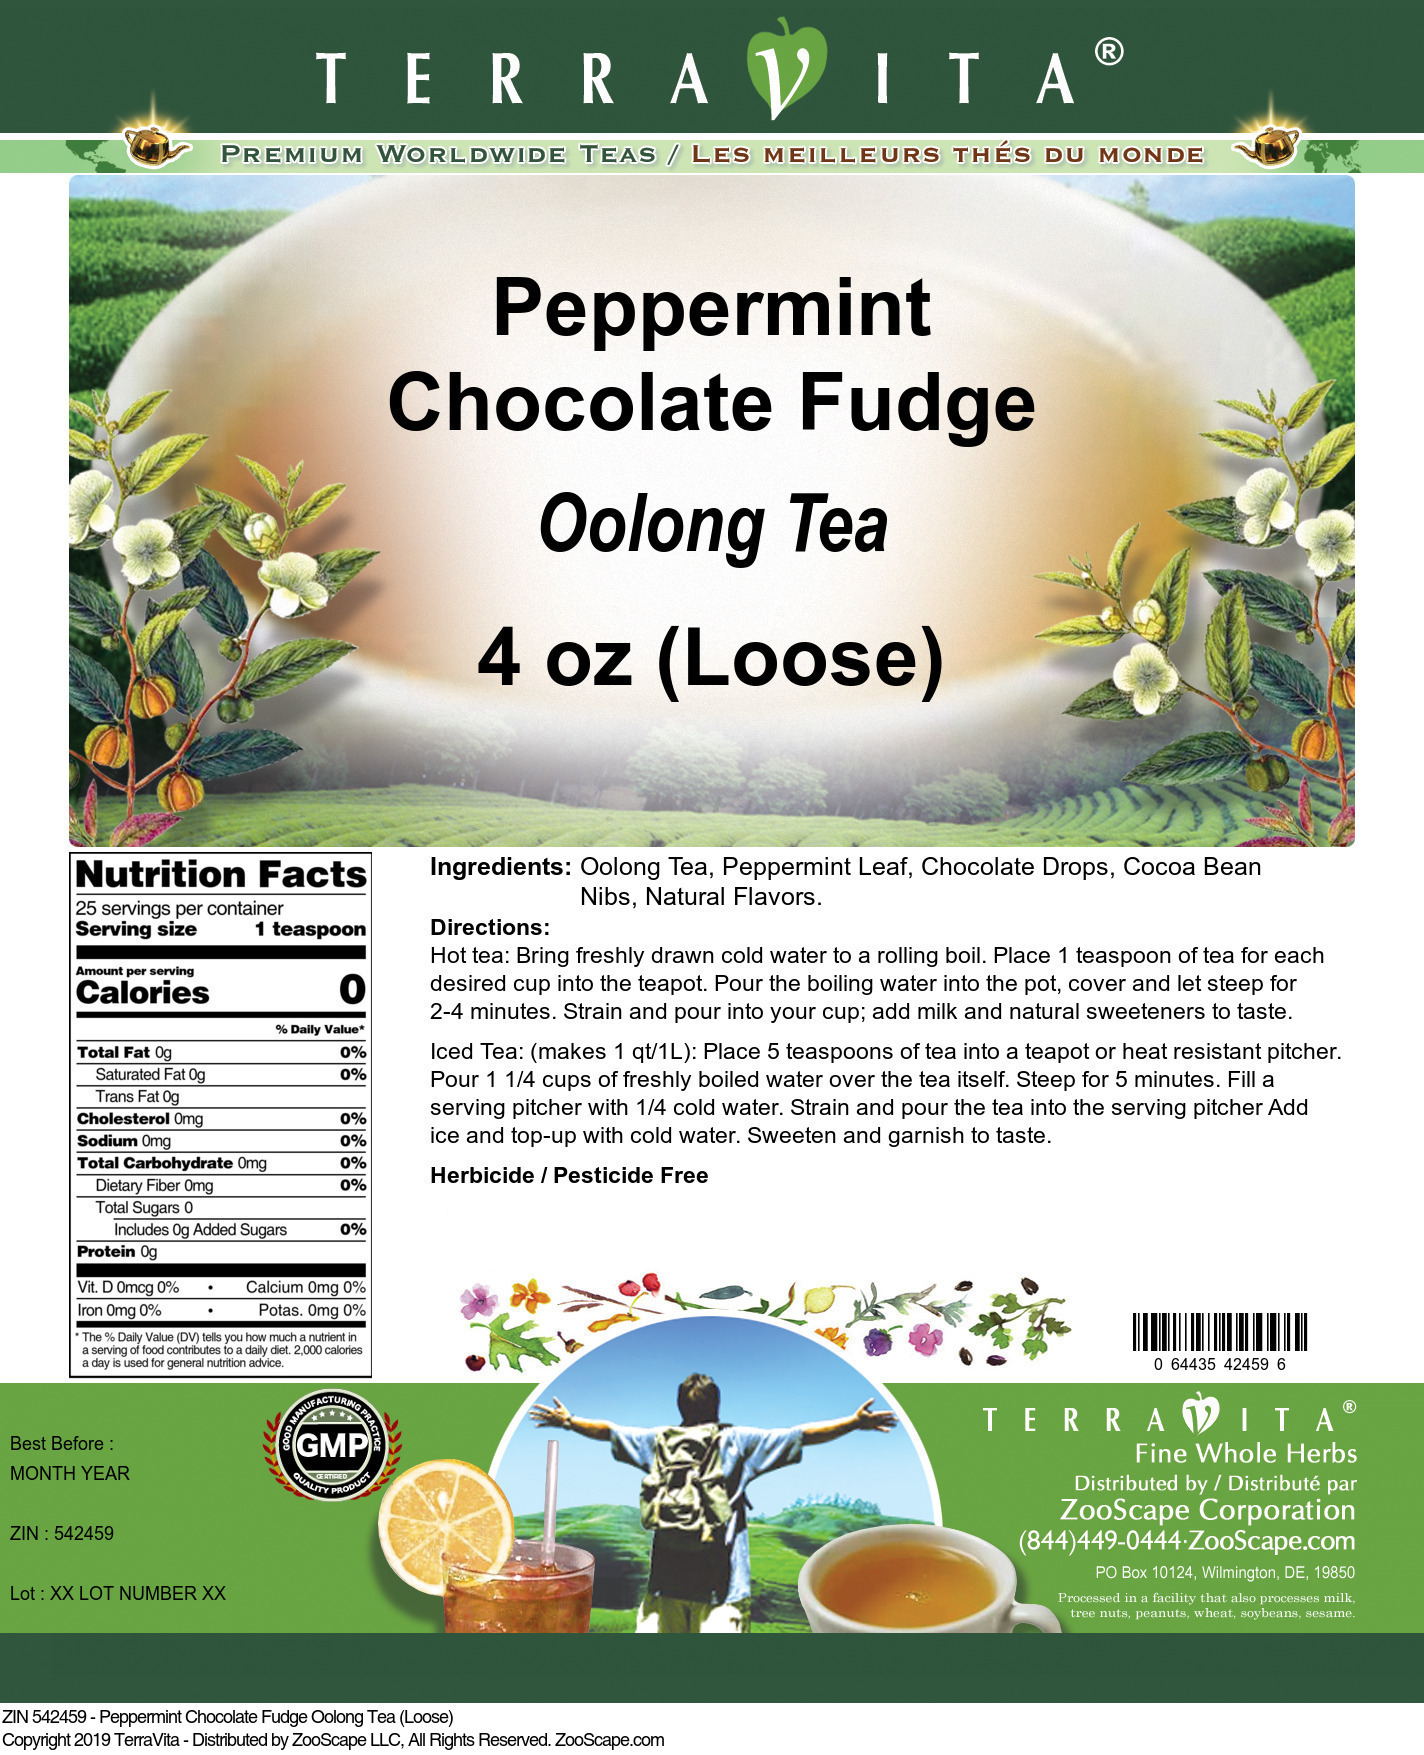 Peppermint Chocolate Fudge Oolong Tea